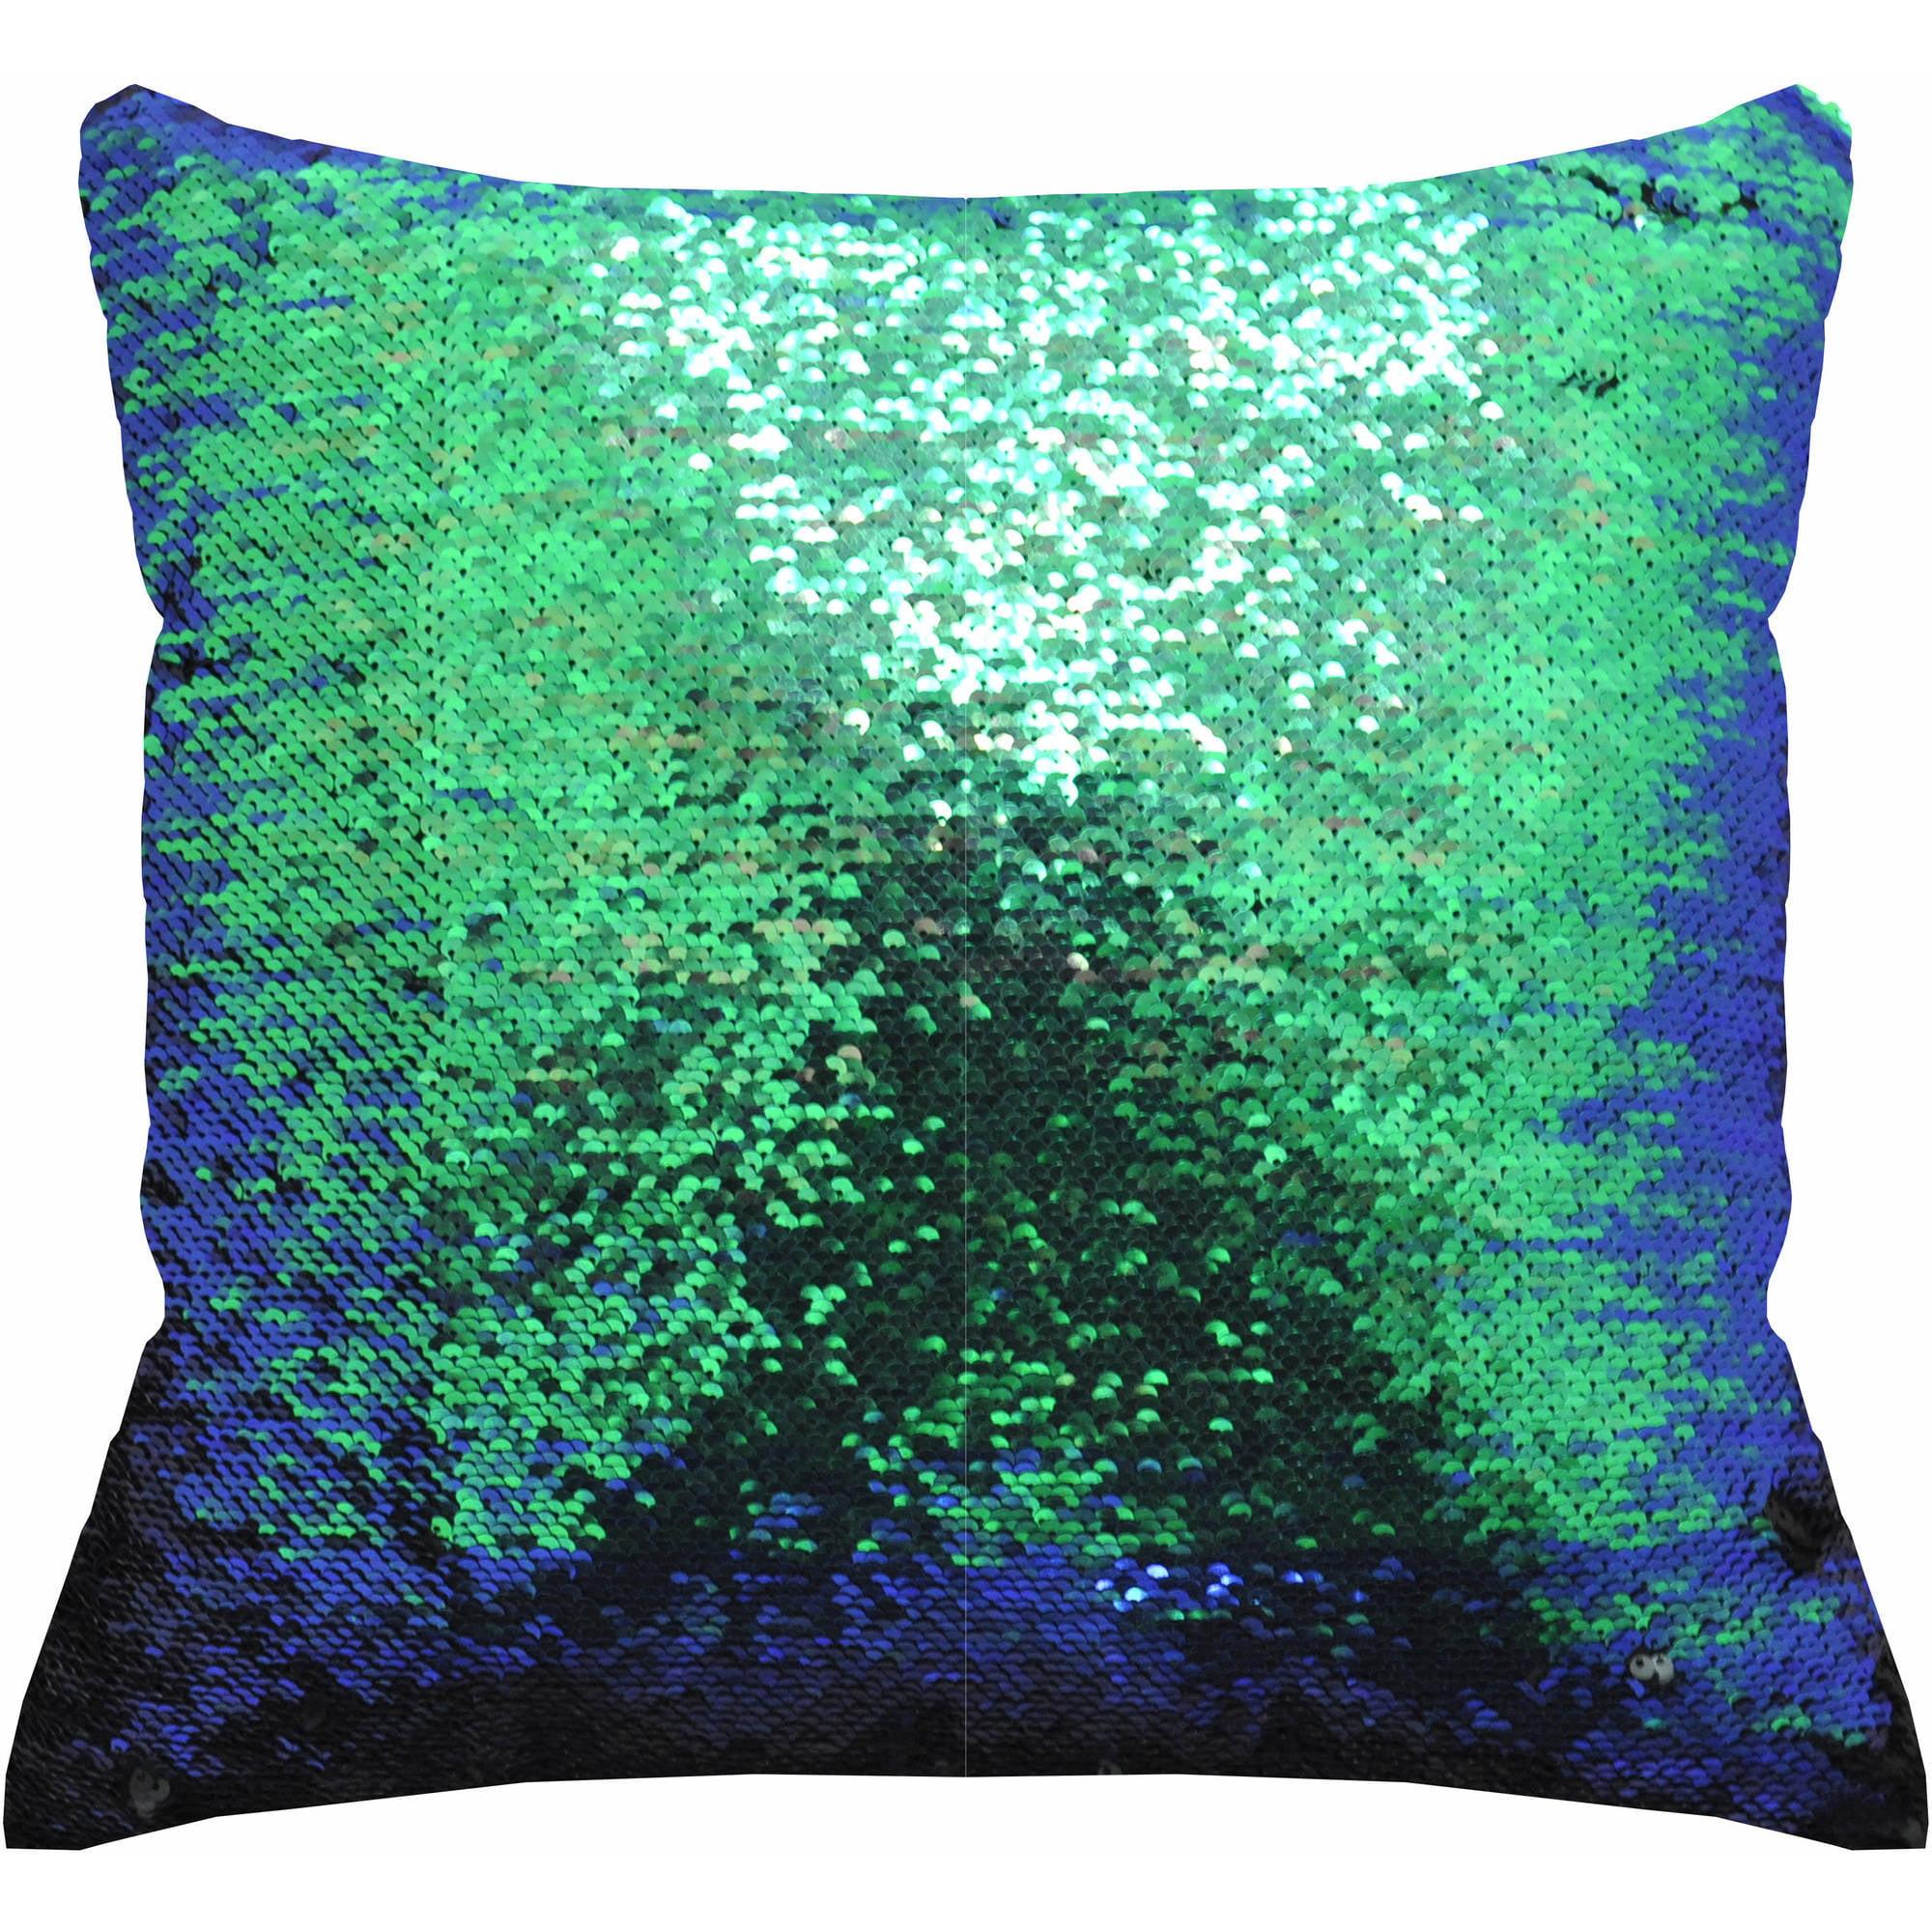 Mainstays Reversible Sequin Decorative Throw Pillow 17x17 Teal